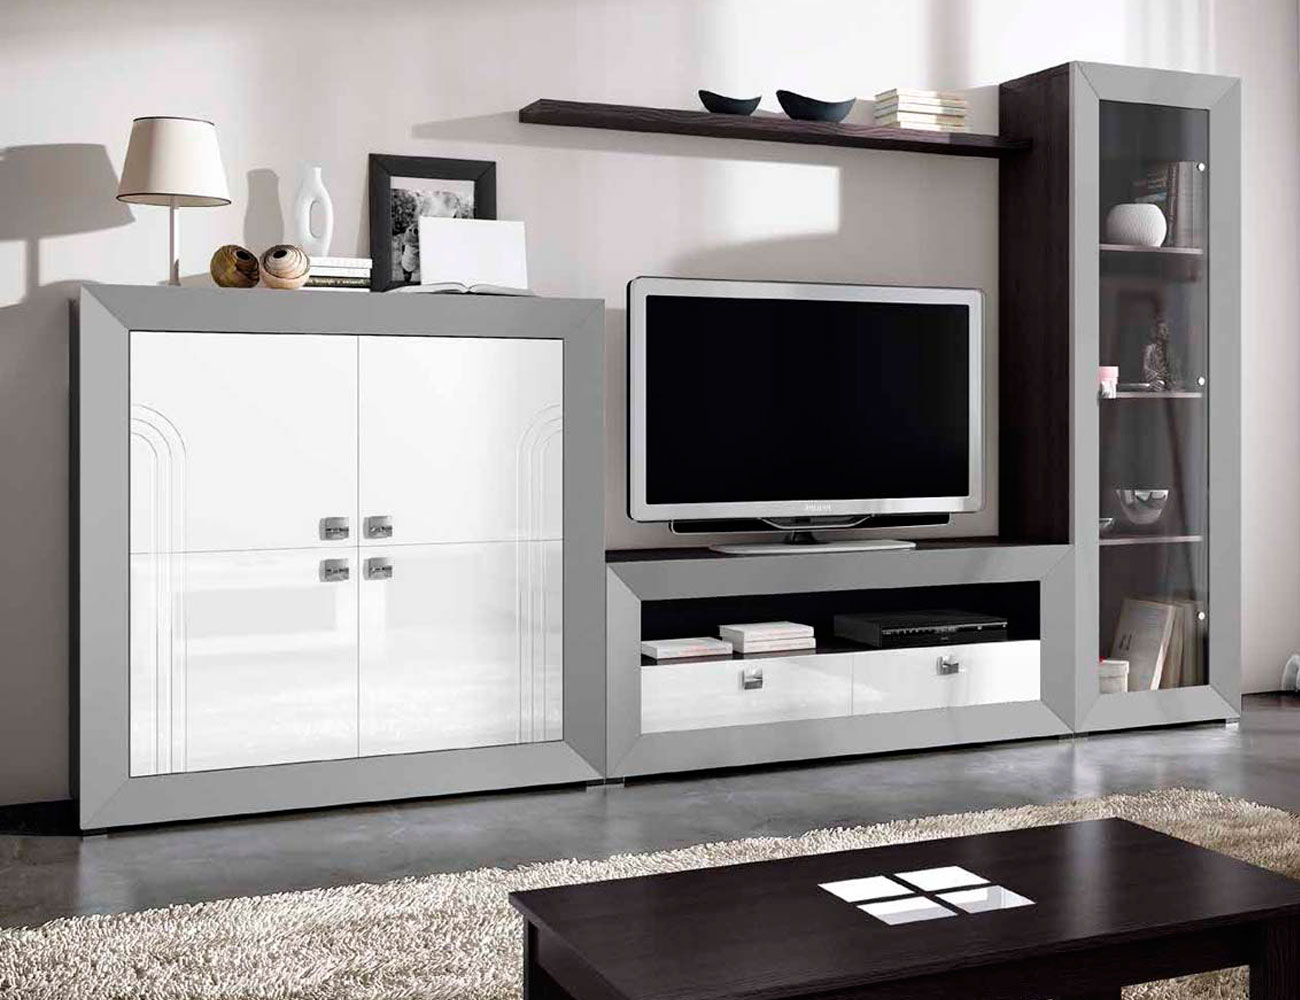 Mueble salon moderno 043